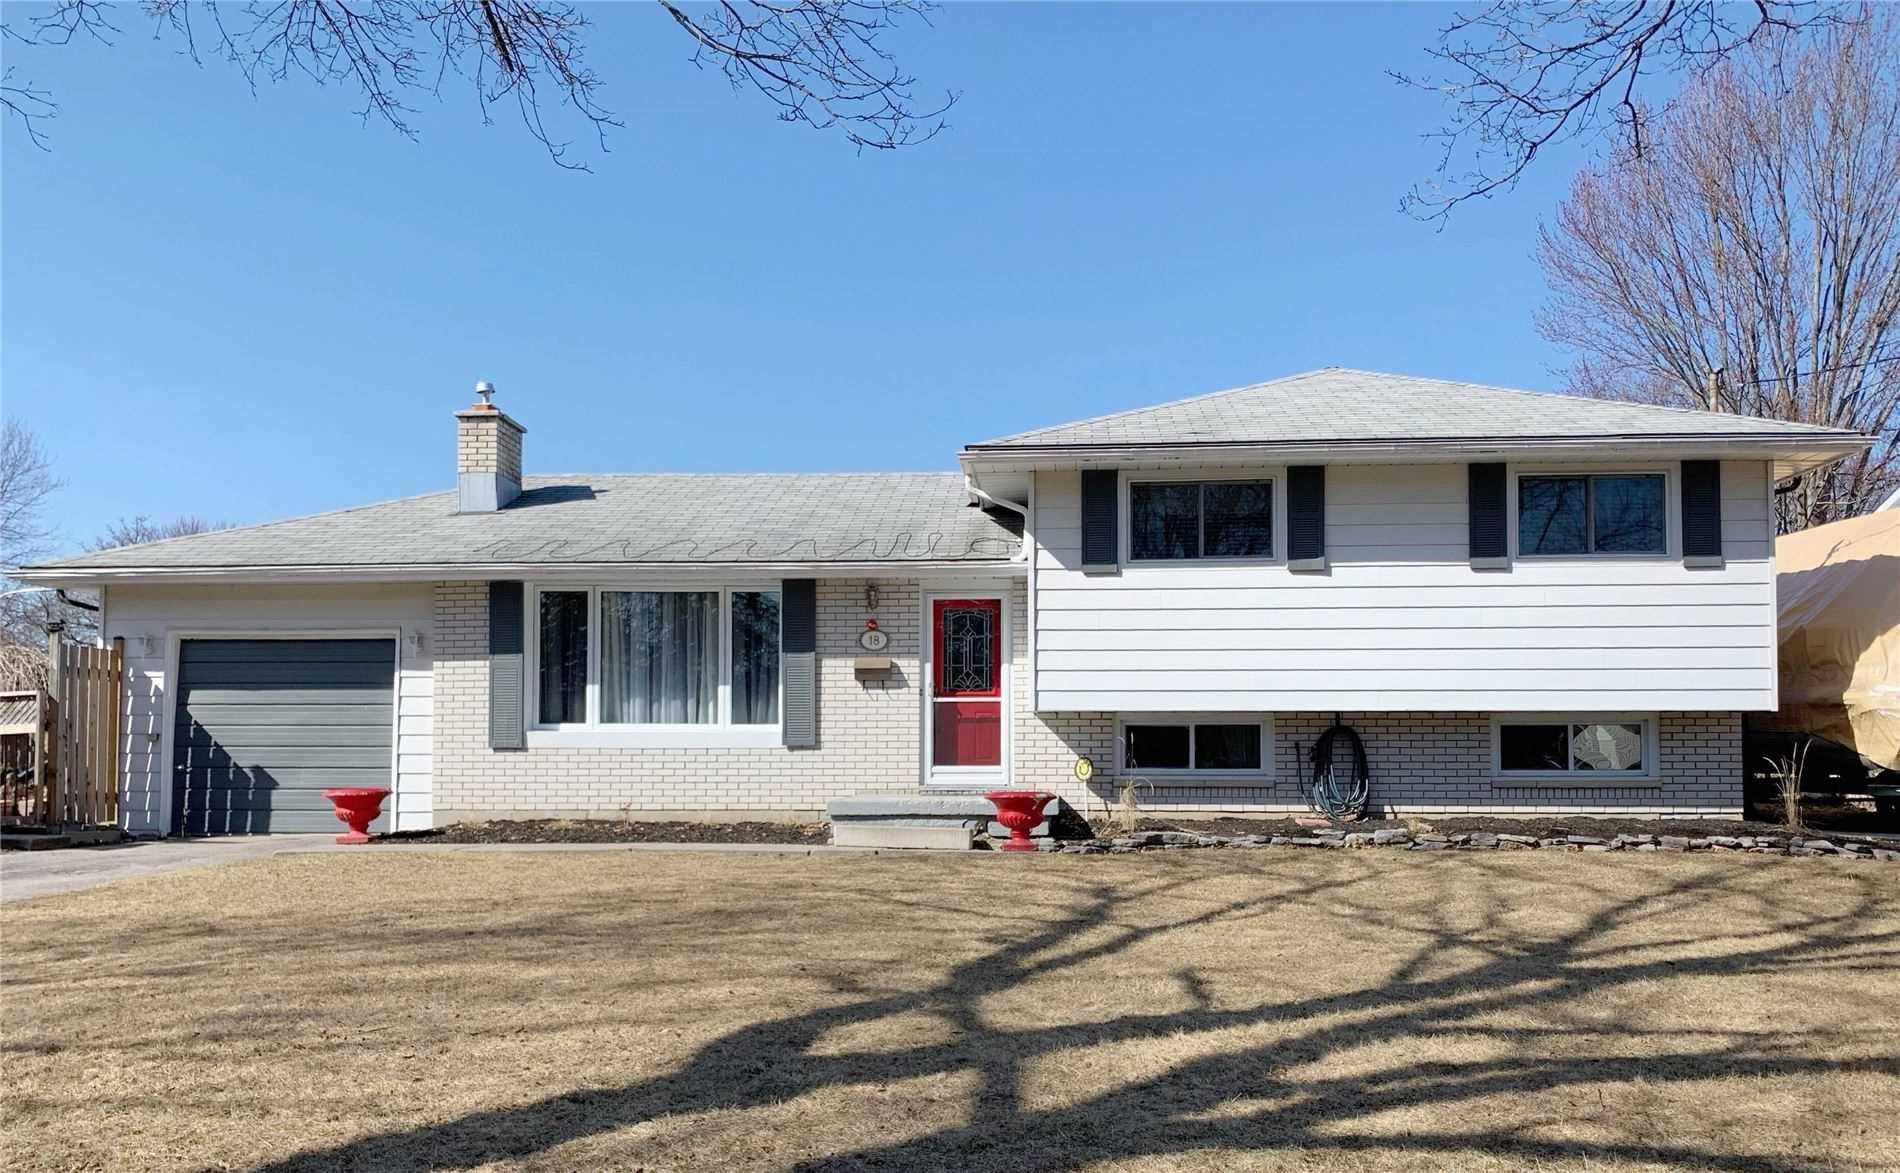 18 Hutton Dr, Belleville, Ontario K8P 1G2, 3 Bedrooms Bedrooms, ,2 BathroomsBathrooms,Detached,For Sale,Hutton,X5165364